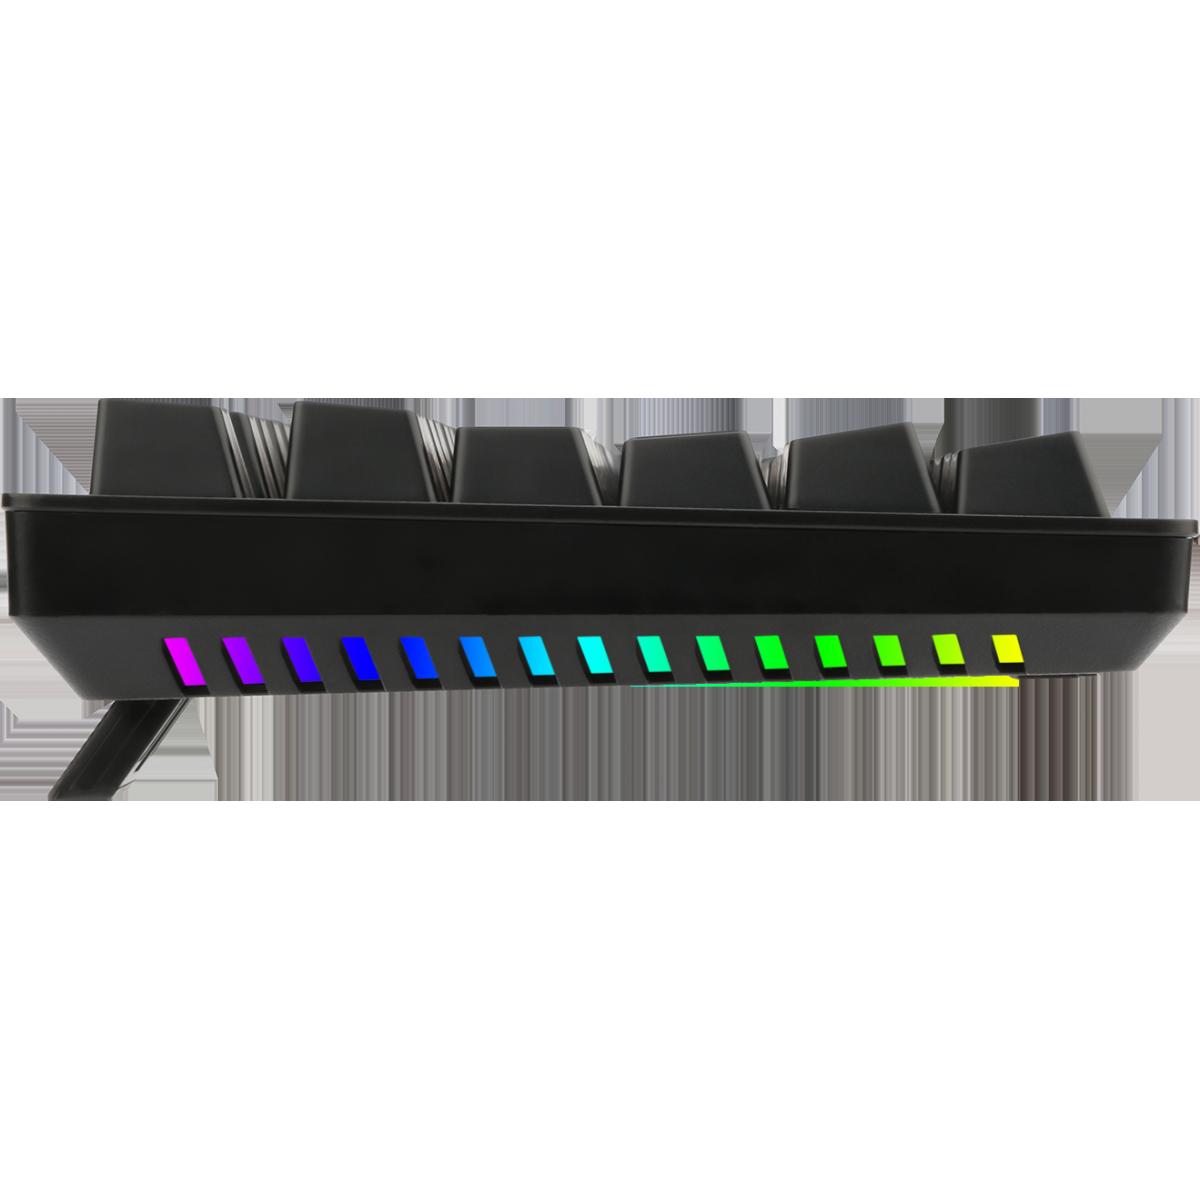 Teclado Gamer Mecânico T-Dagger Bermuda, Switch Blue, Black